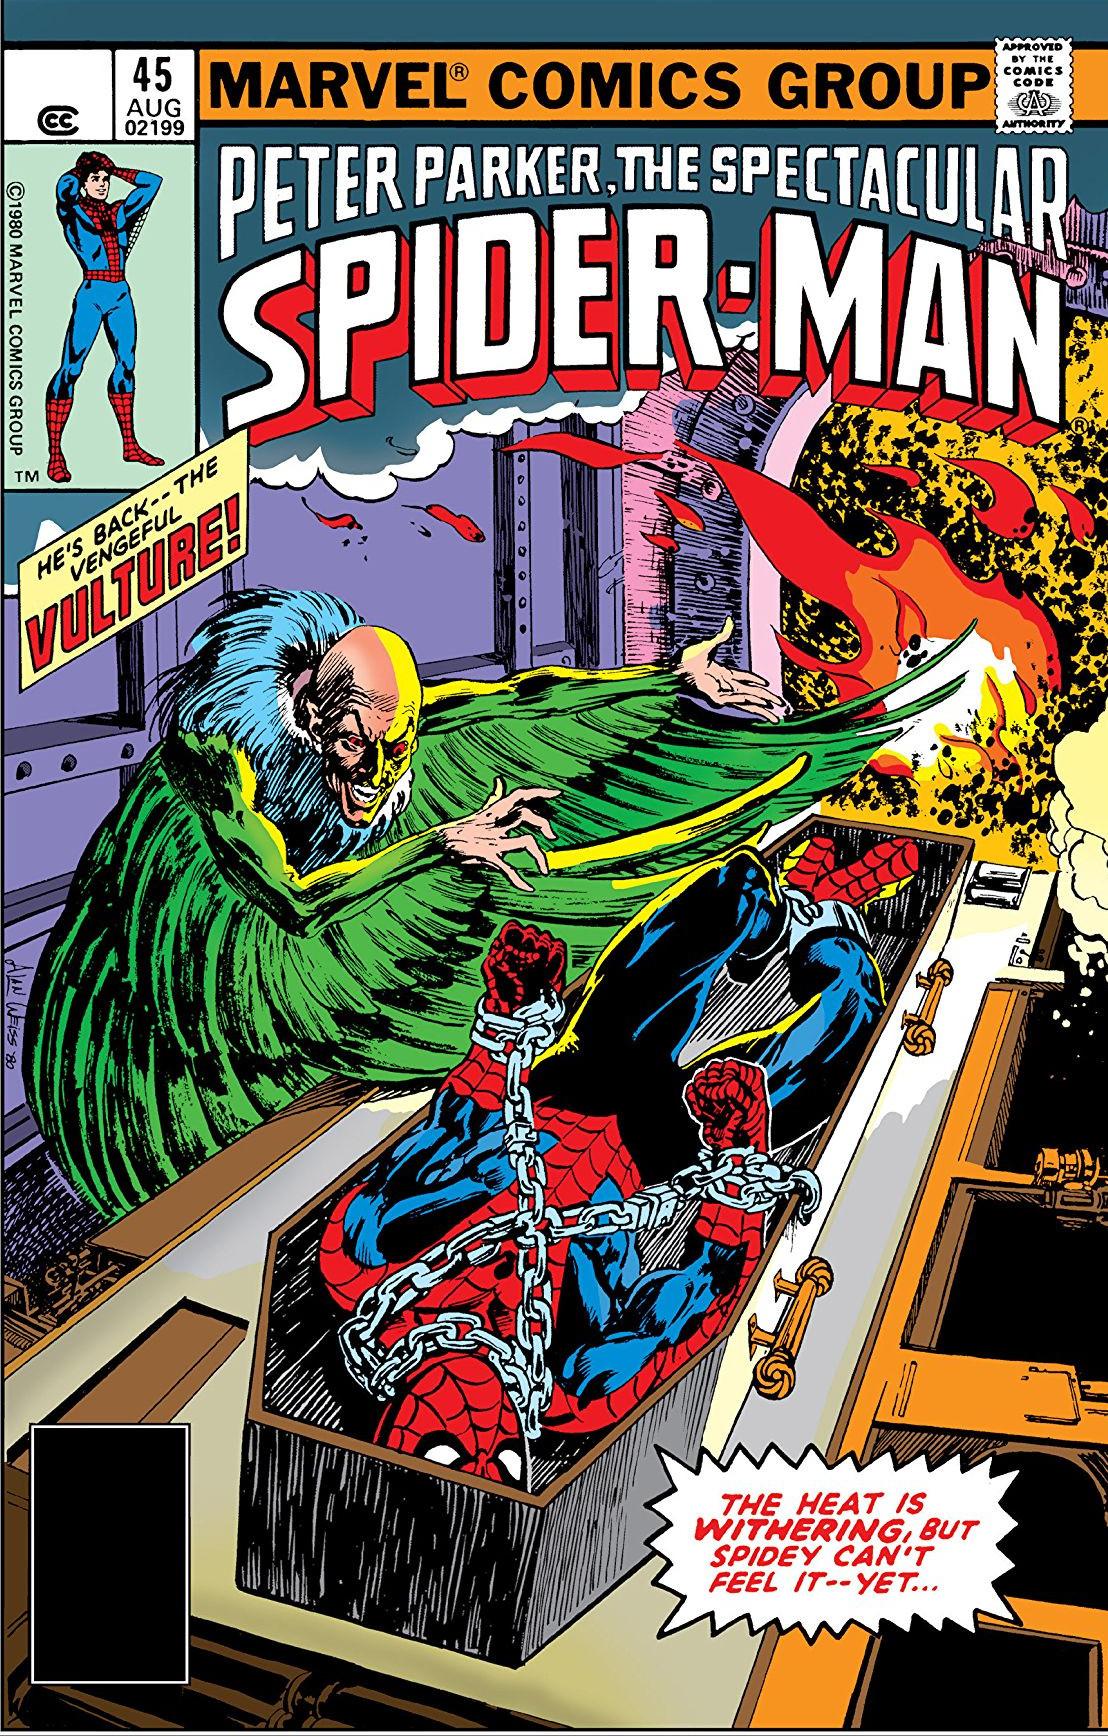 Peter Parker, The Spectacular Spider-Man Vol 1 45